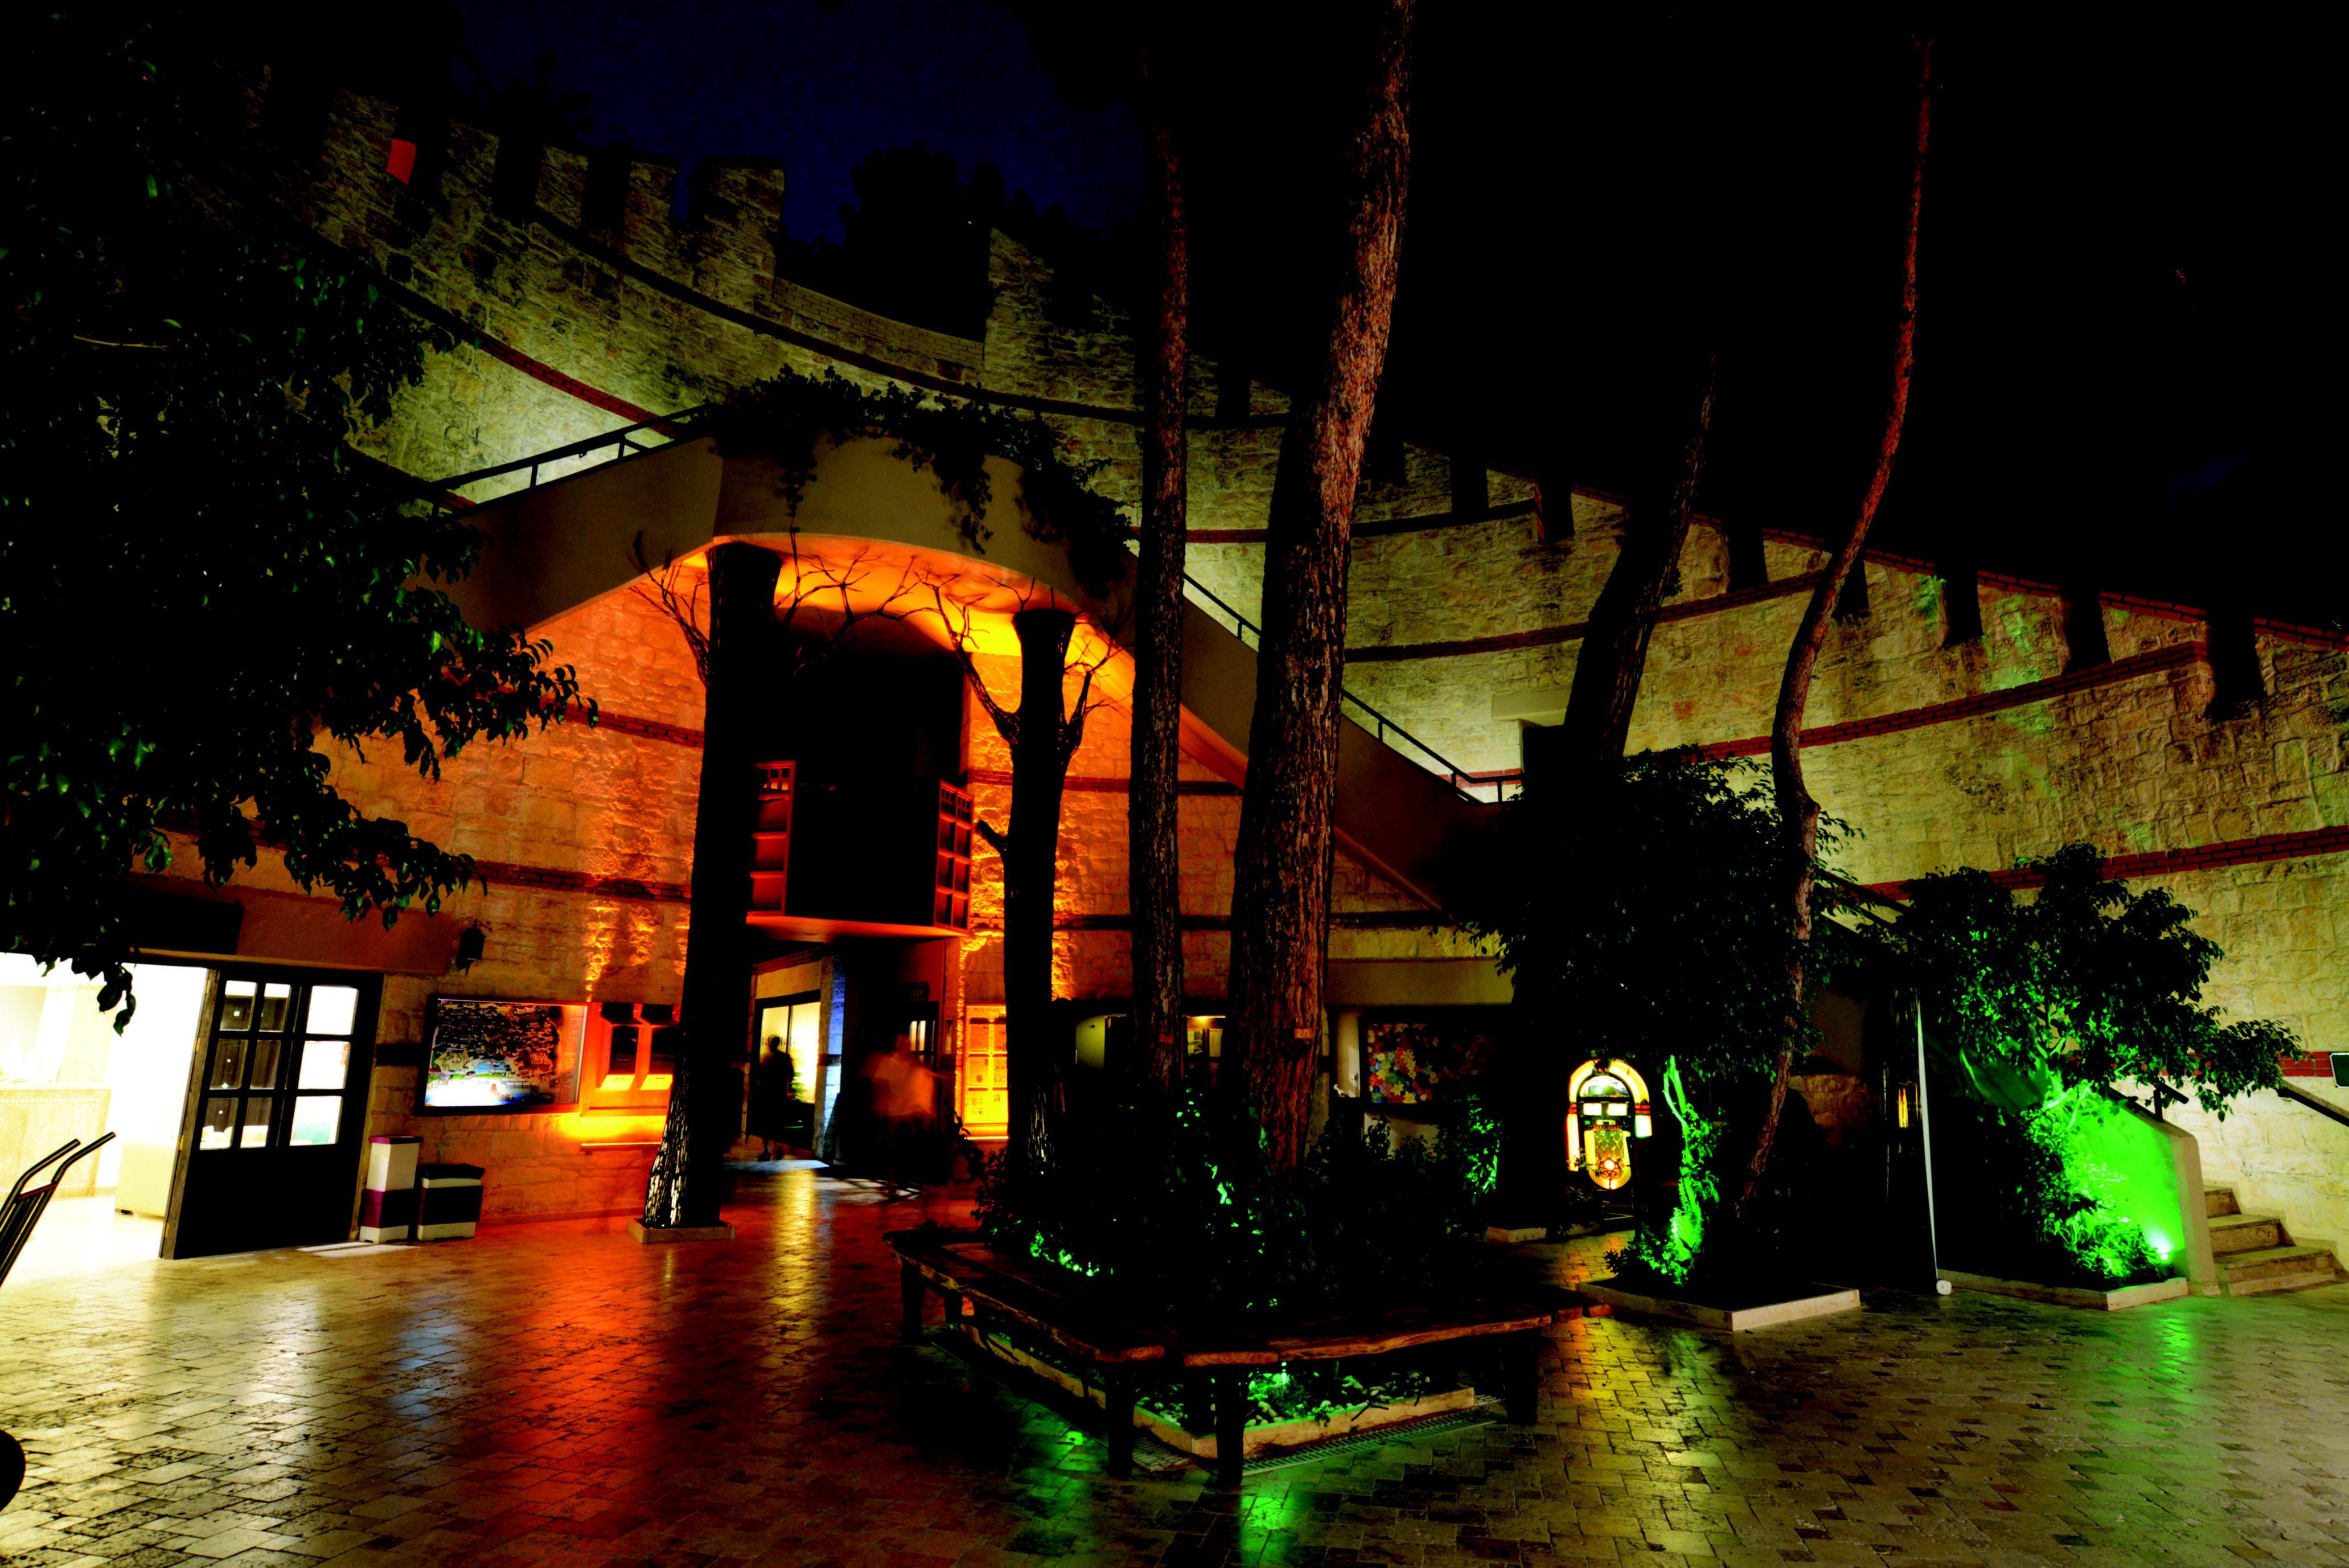 http://www.orextravel.sk/OREX/hotelphotos/ulusoy-kemer-holiday-club-area-0028.jpg